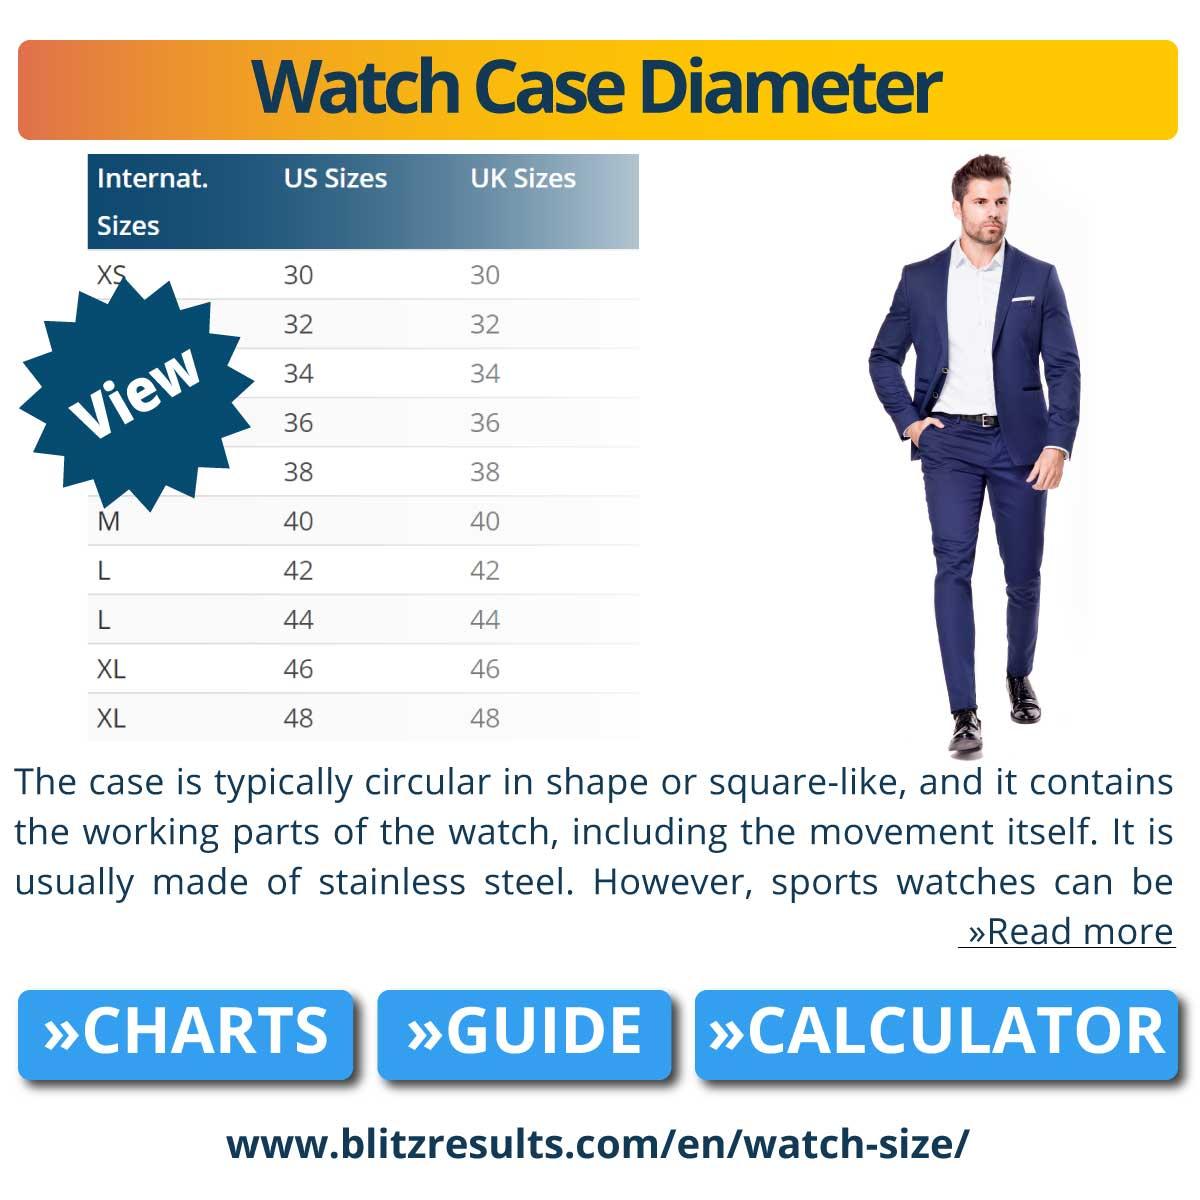 Watch Case Diameter